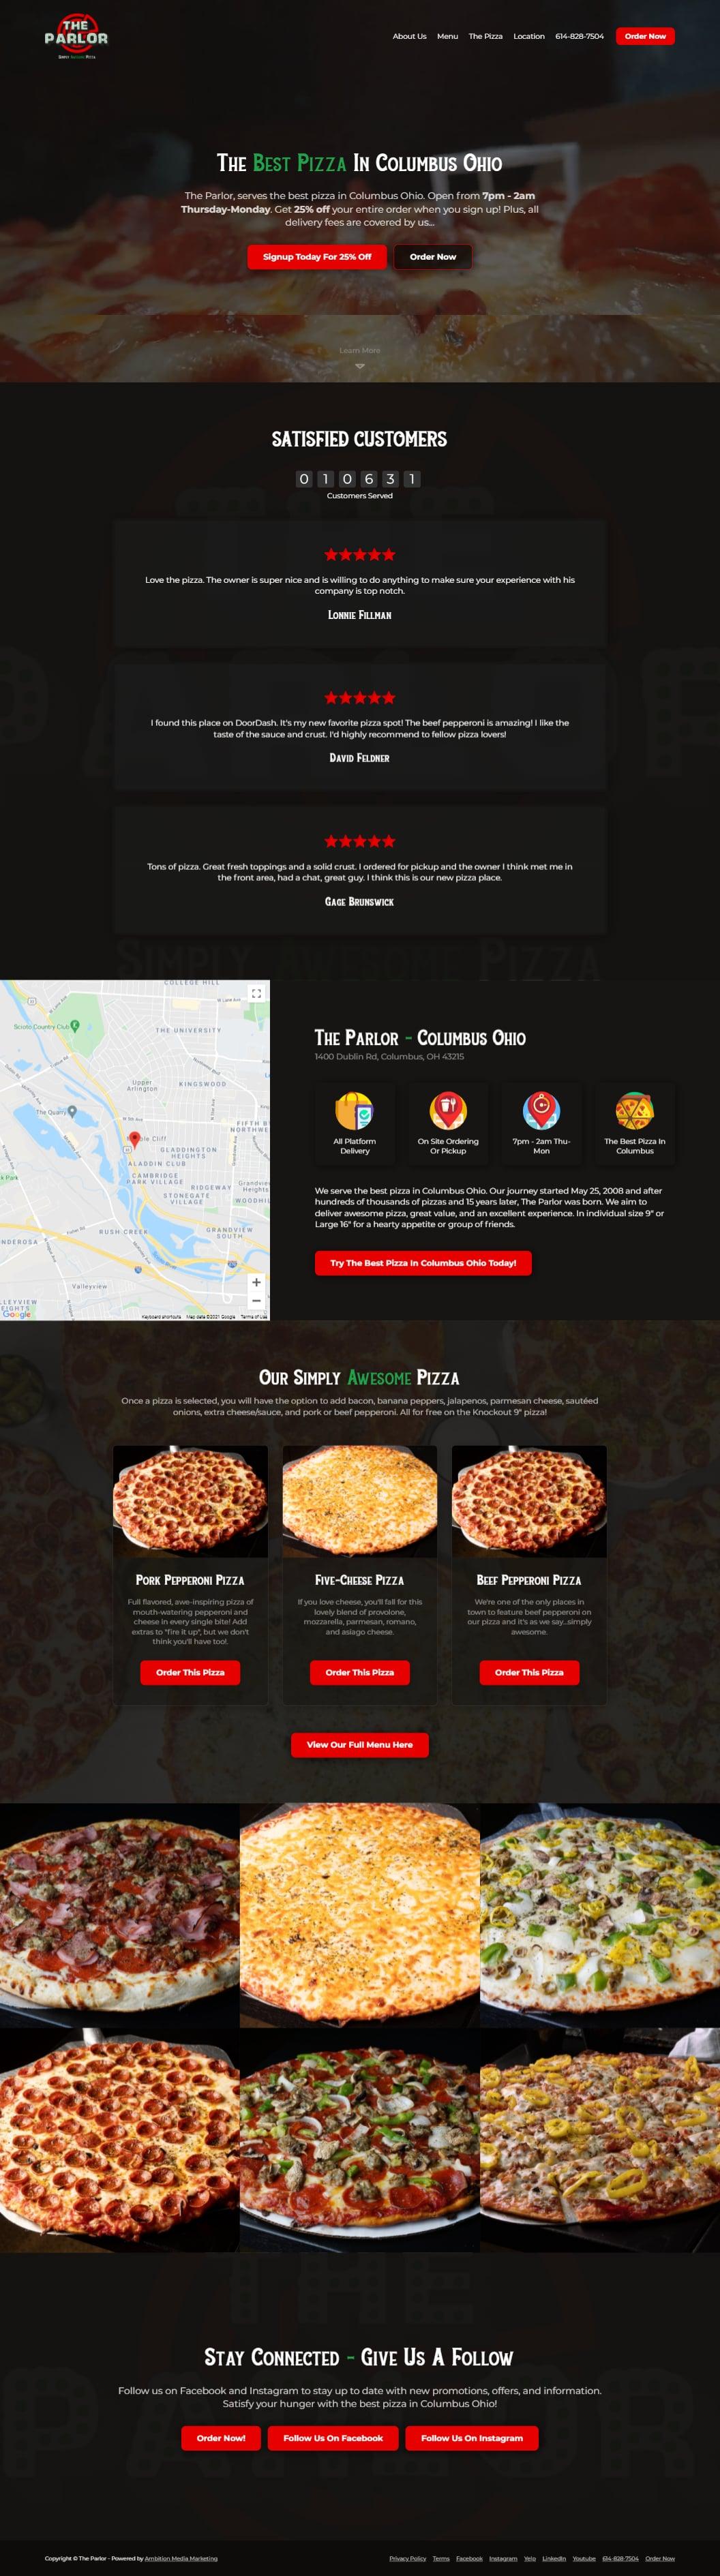 Serves the best pizza in Columbus Ohio